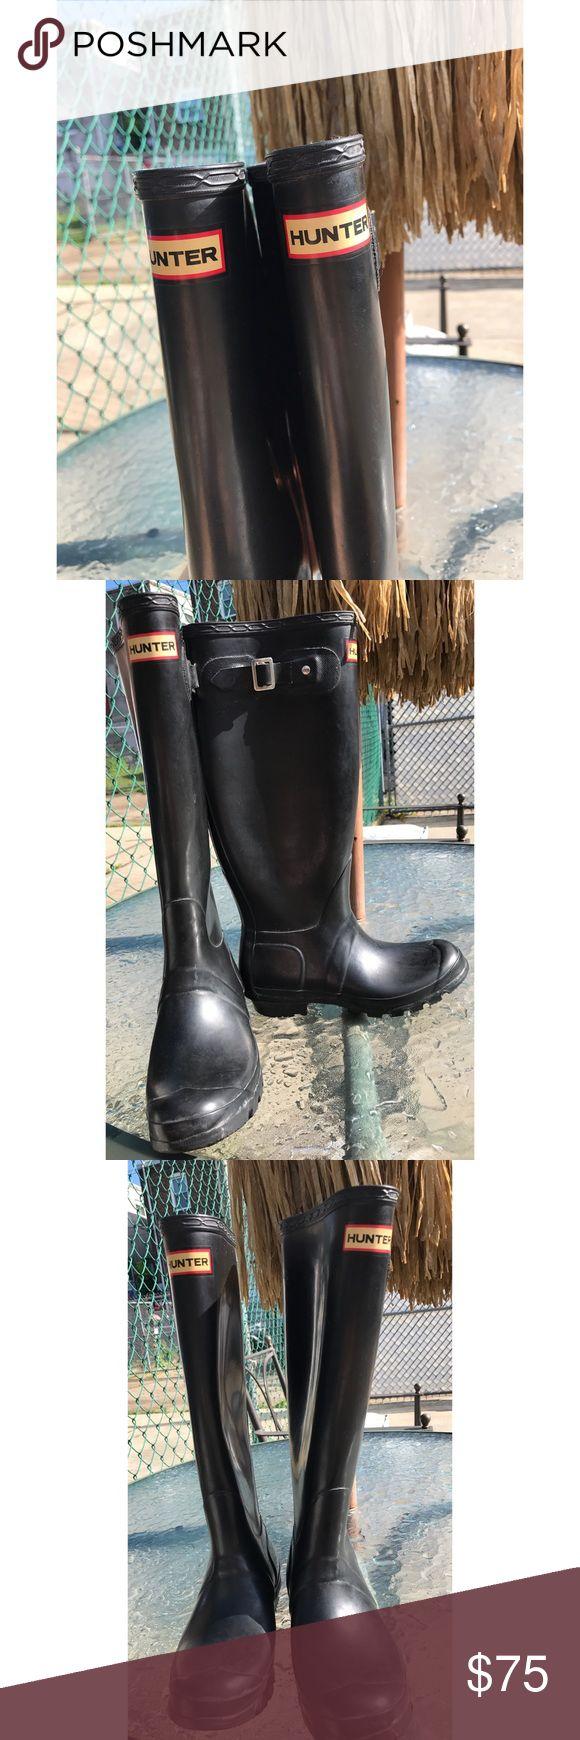 Hunter Original Tall Boots - Glossy •W23499 •Size: US-5M/6F UK-4 EU-37 Hunter Boots Shoes Winter & Rain Boots